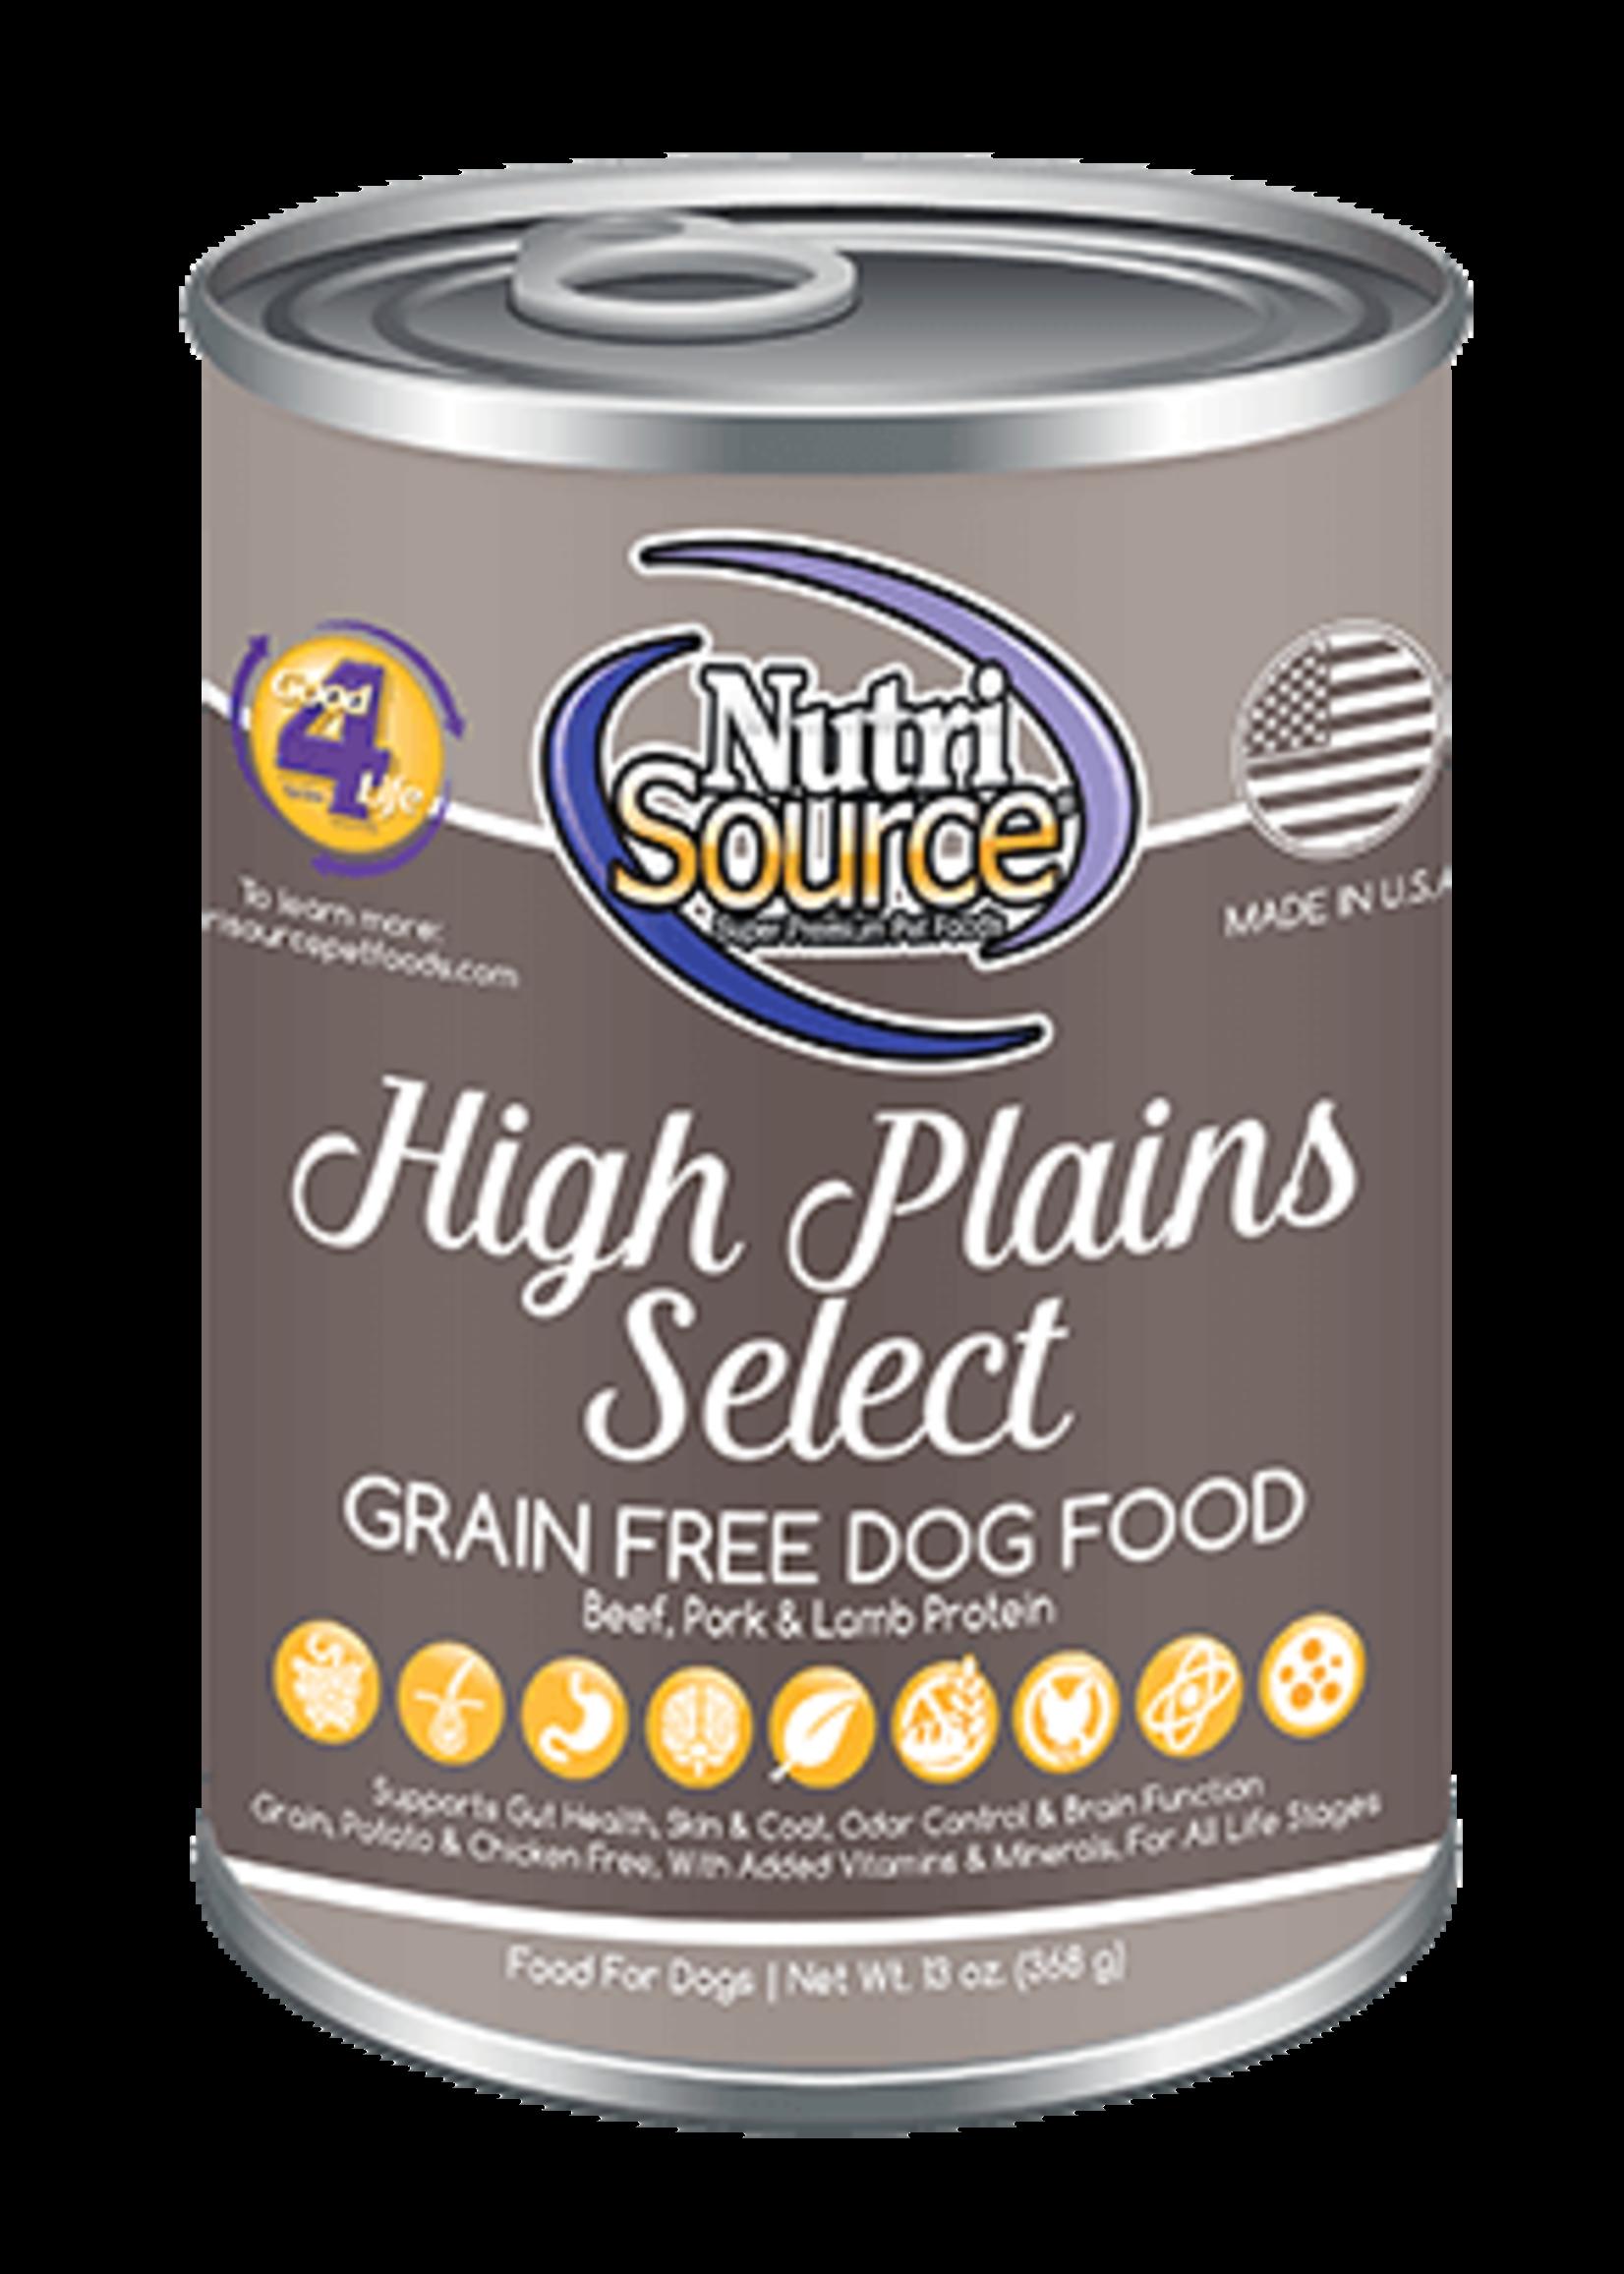 Nutrisource Nutrisource Grain-Free High Plains Select Wet Dog Food 13oz